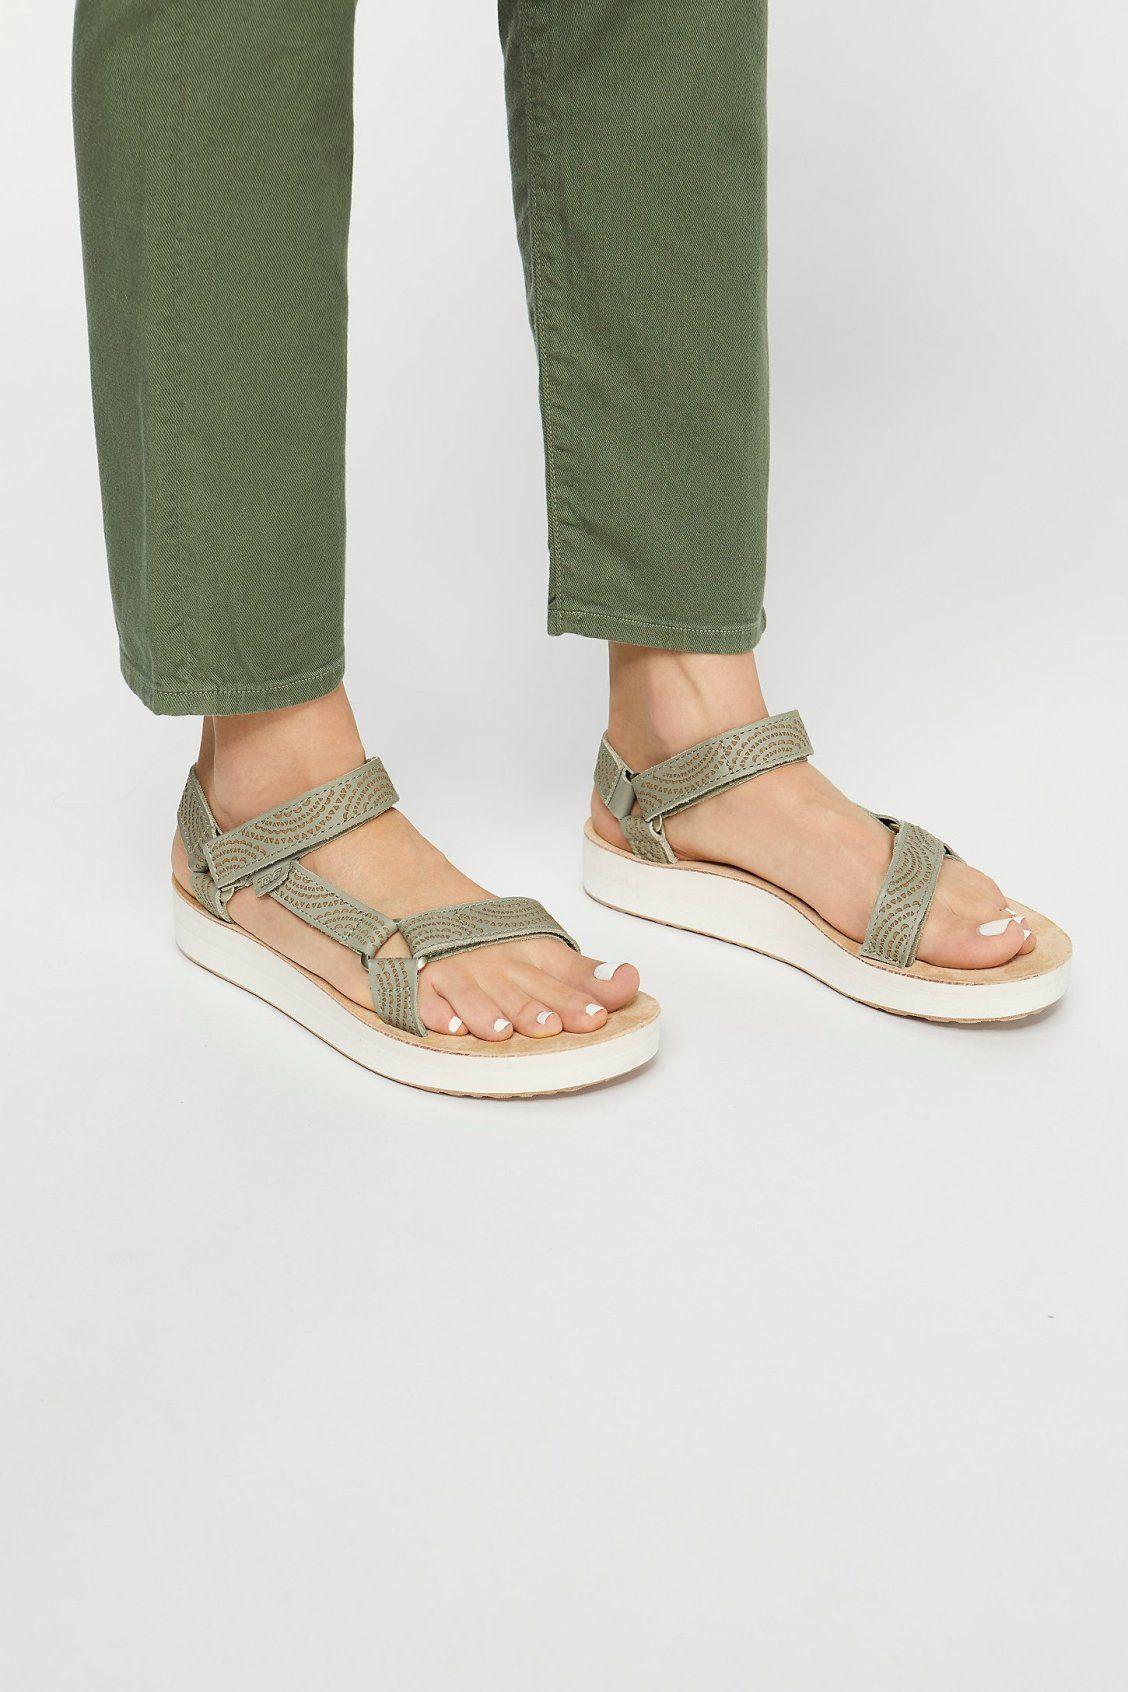 85fc27fff Midform Universal Geometric Teva Sandal